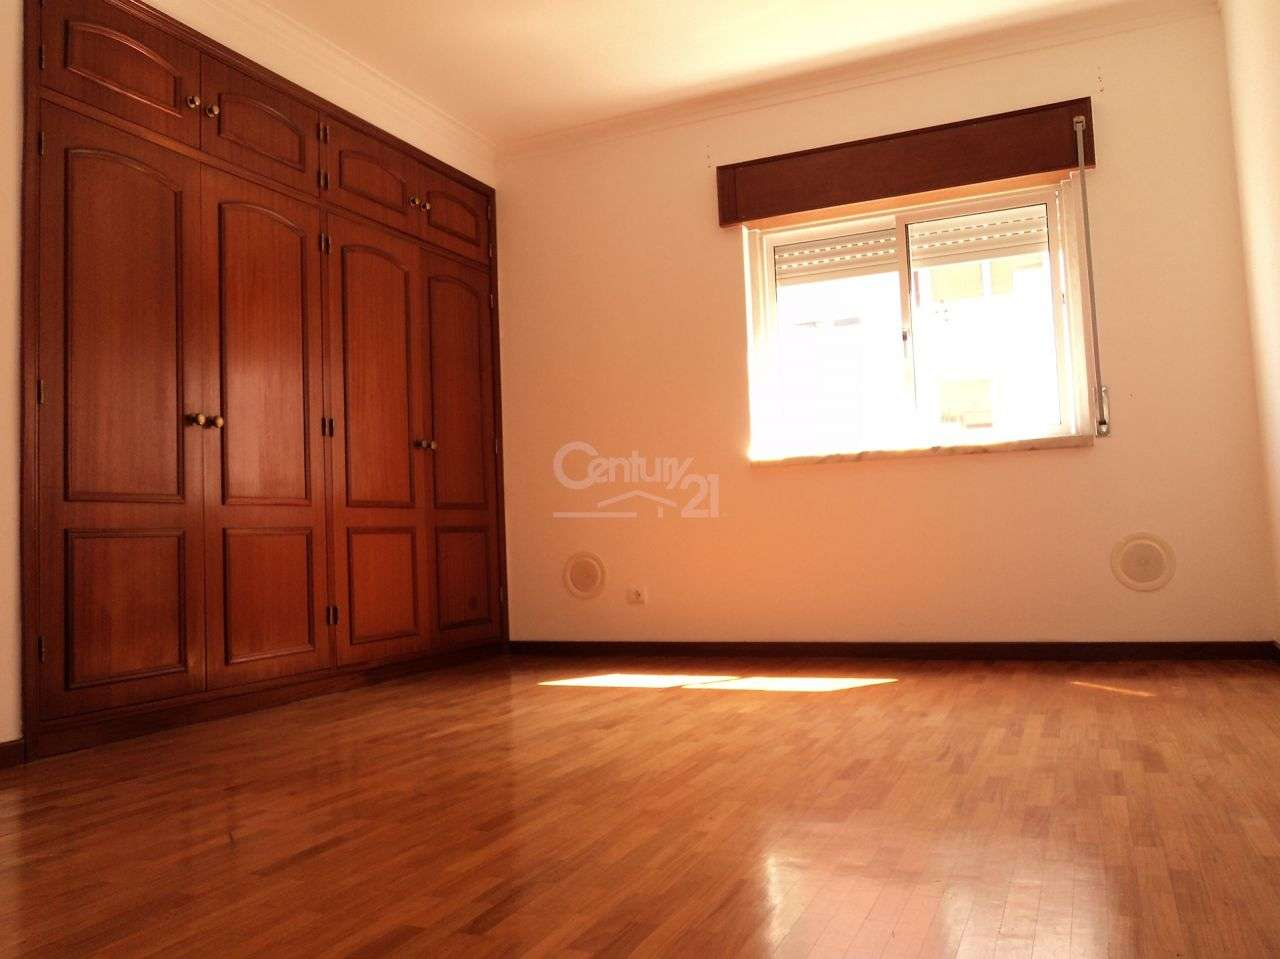 Apartamento para arrendar, Barcarena, Lisboa - Foto 9